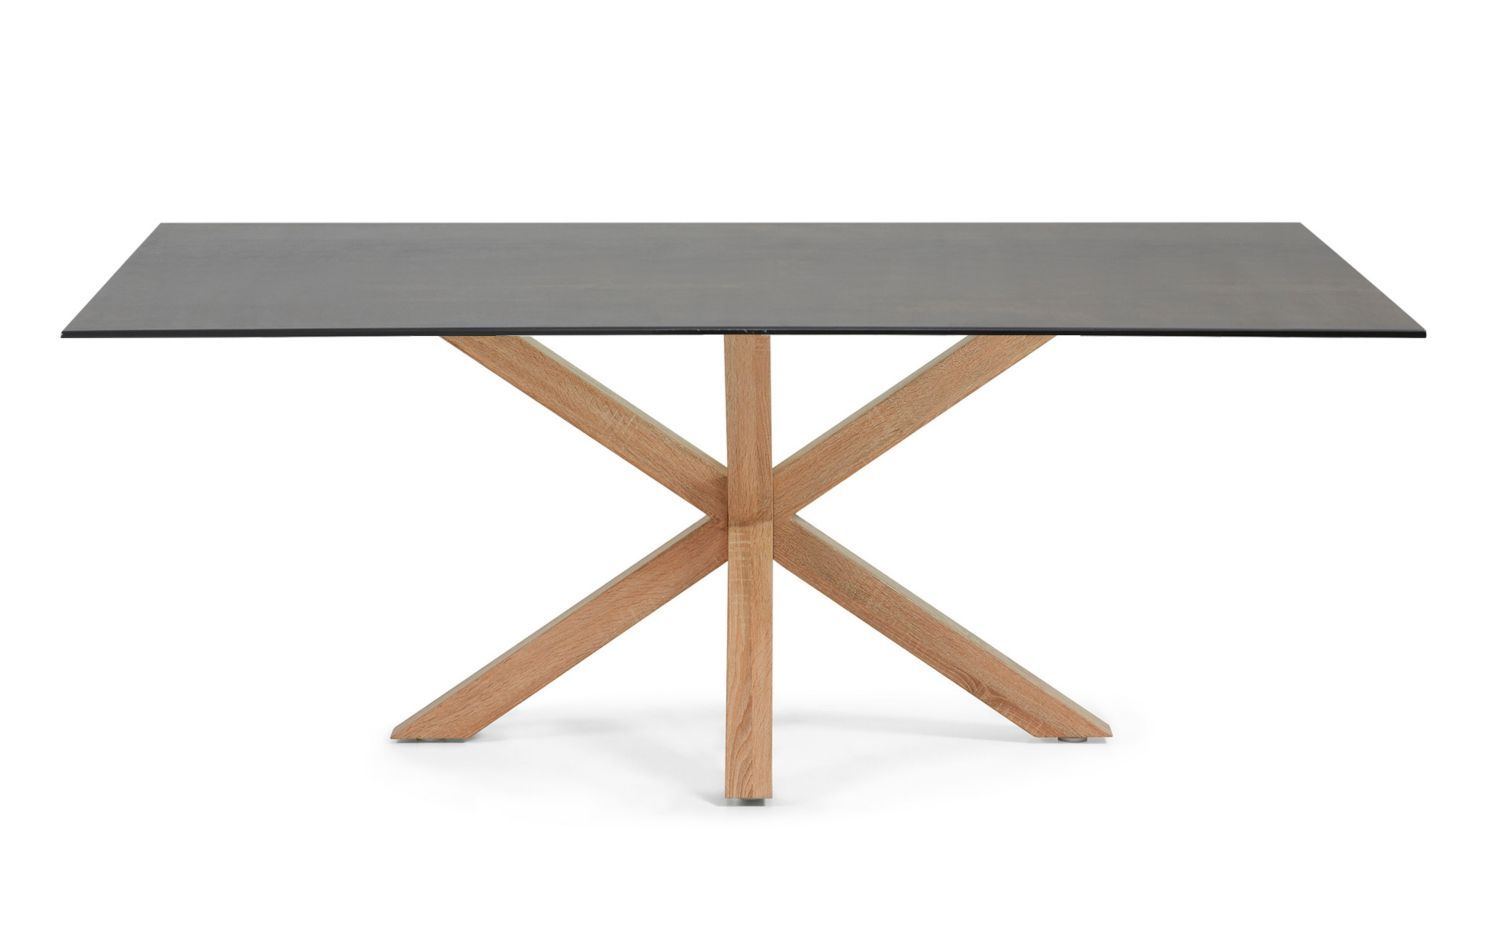 Configuration Arya, Table Fly | Salle À Manger, Séjour tout Table Salle A Manger Extensible Fly